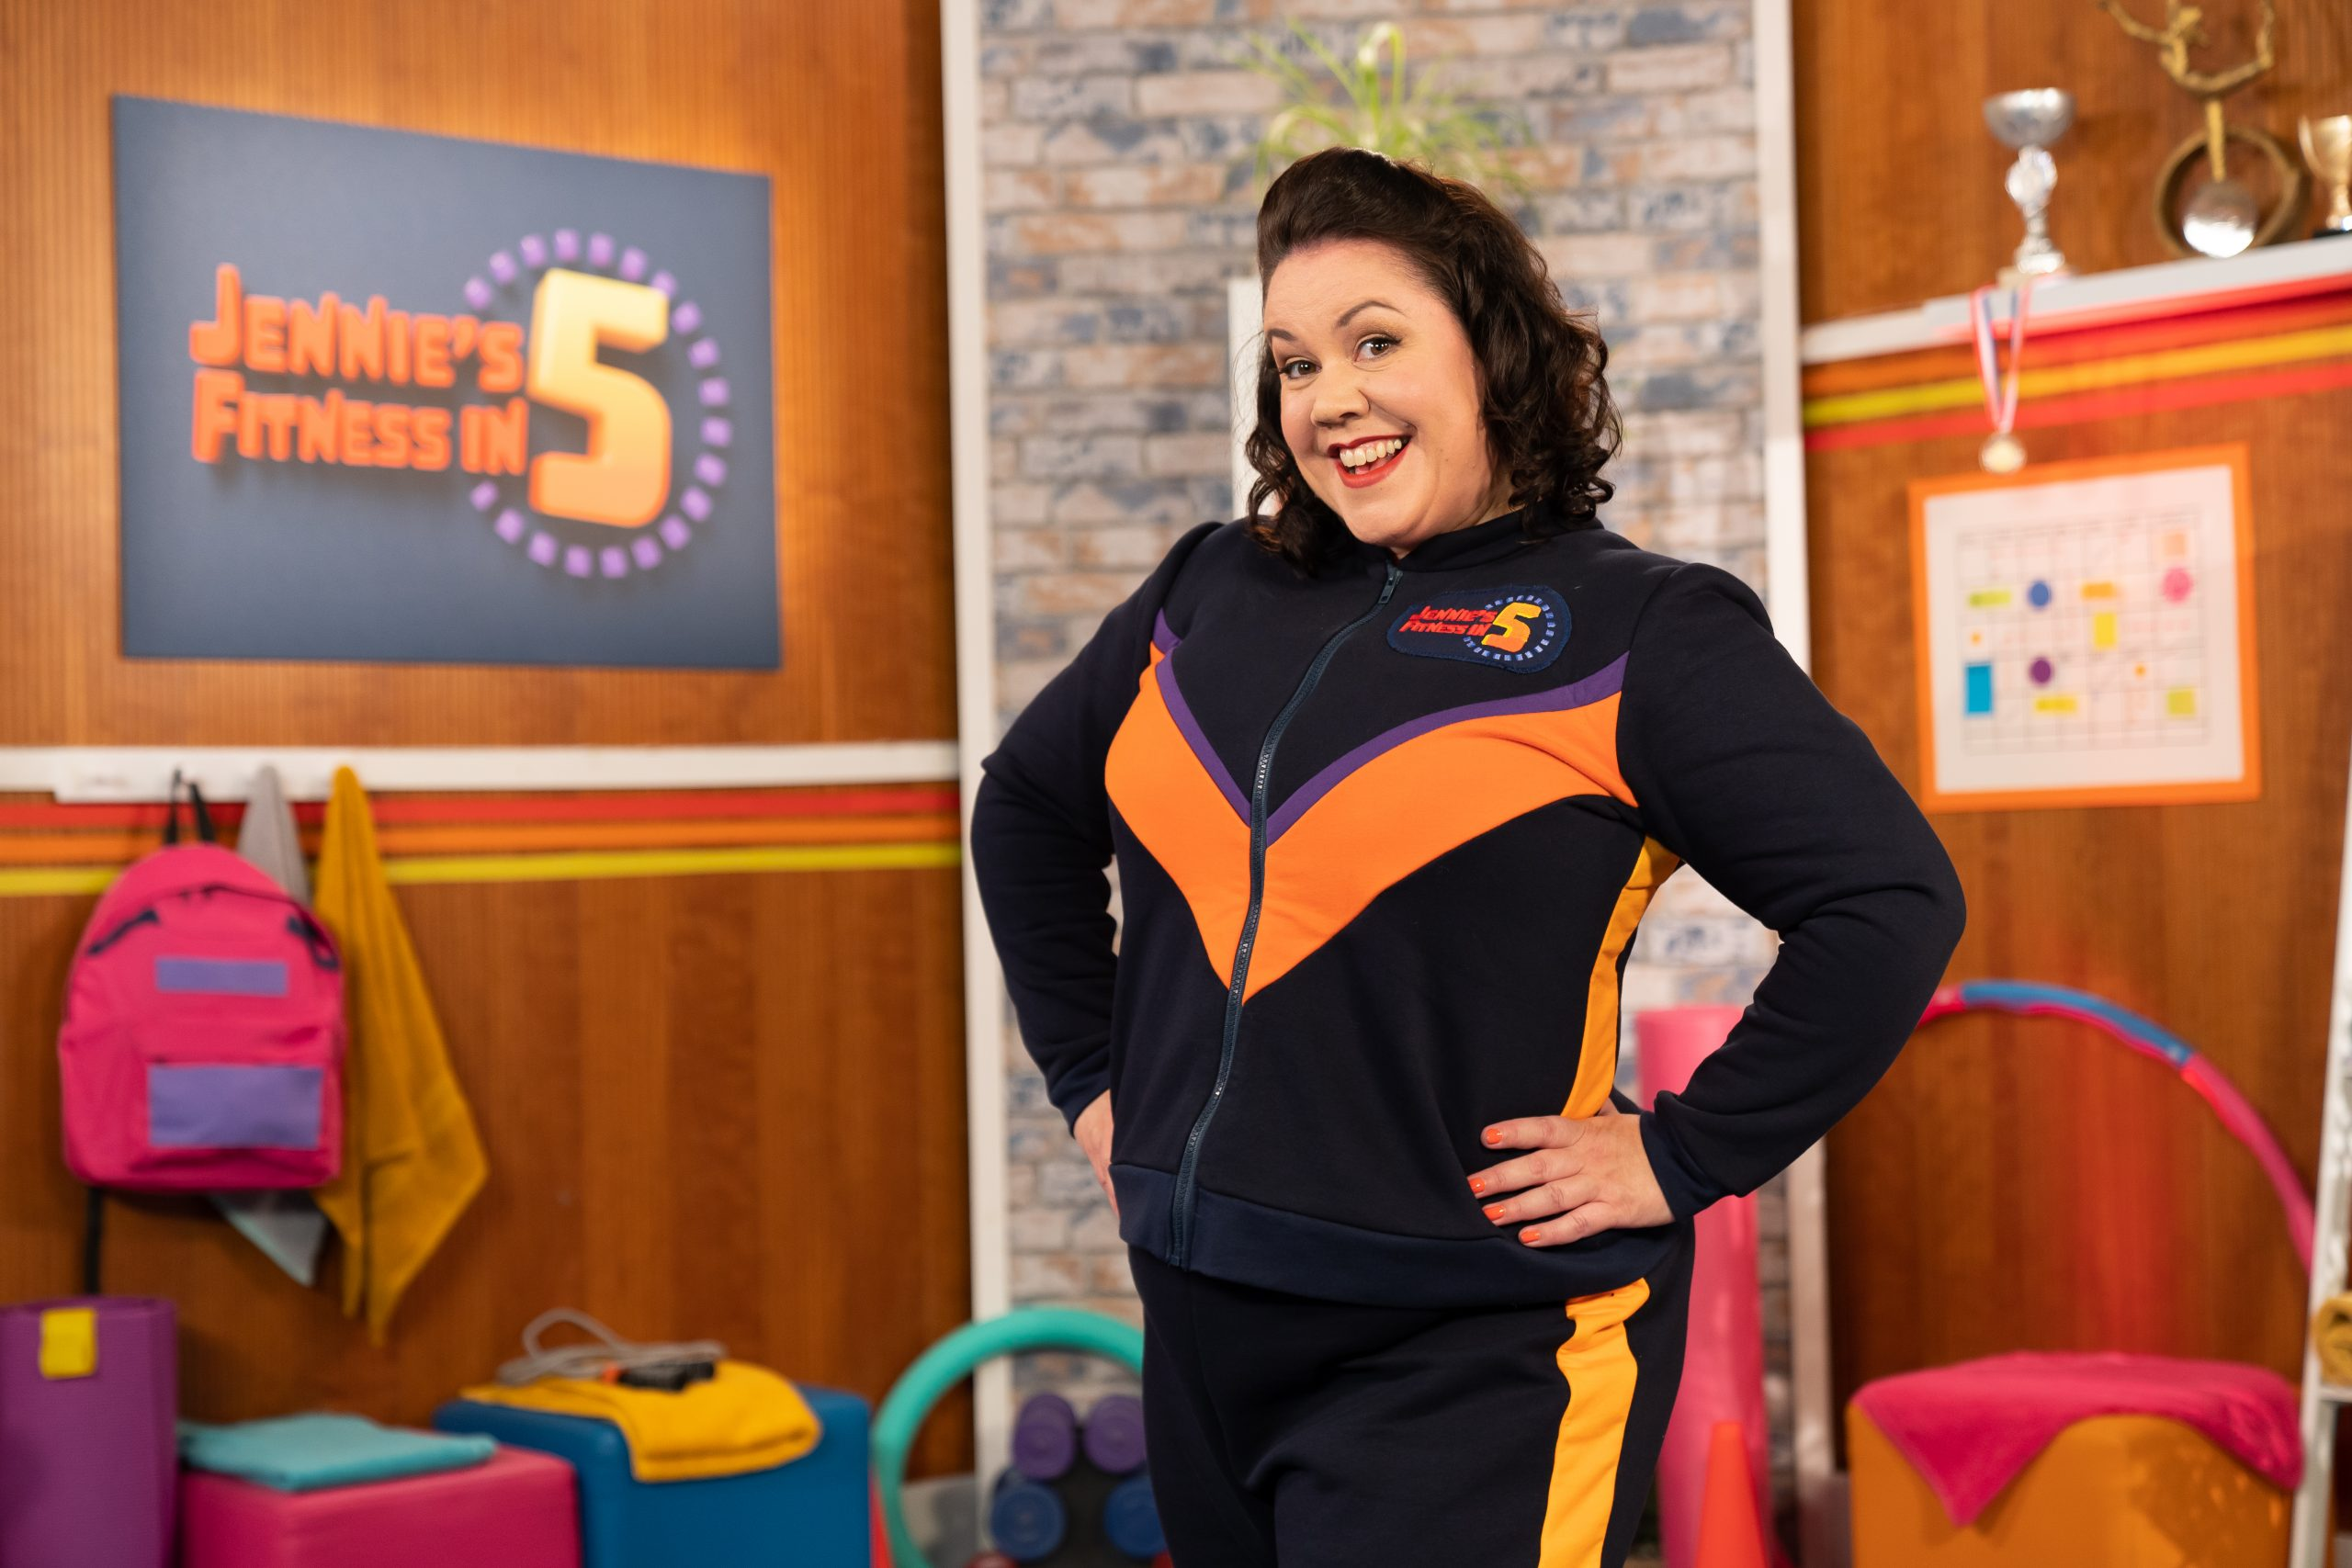 Jennie's Fitness in Five